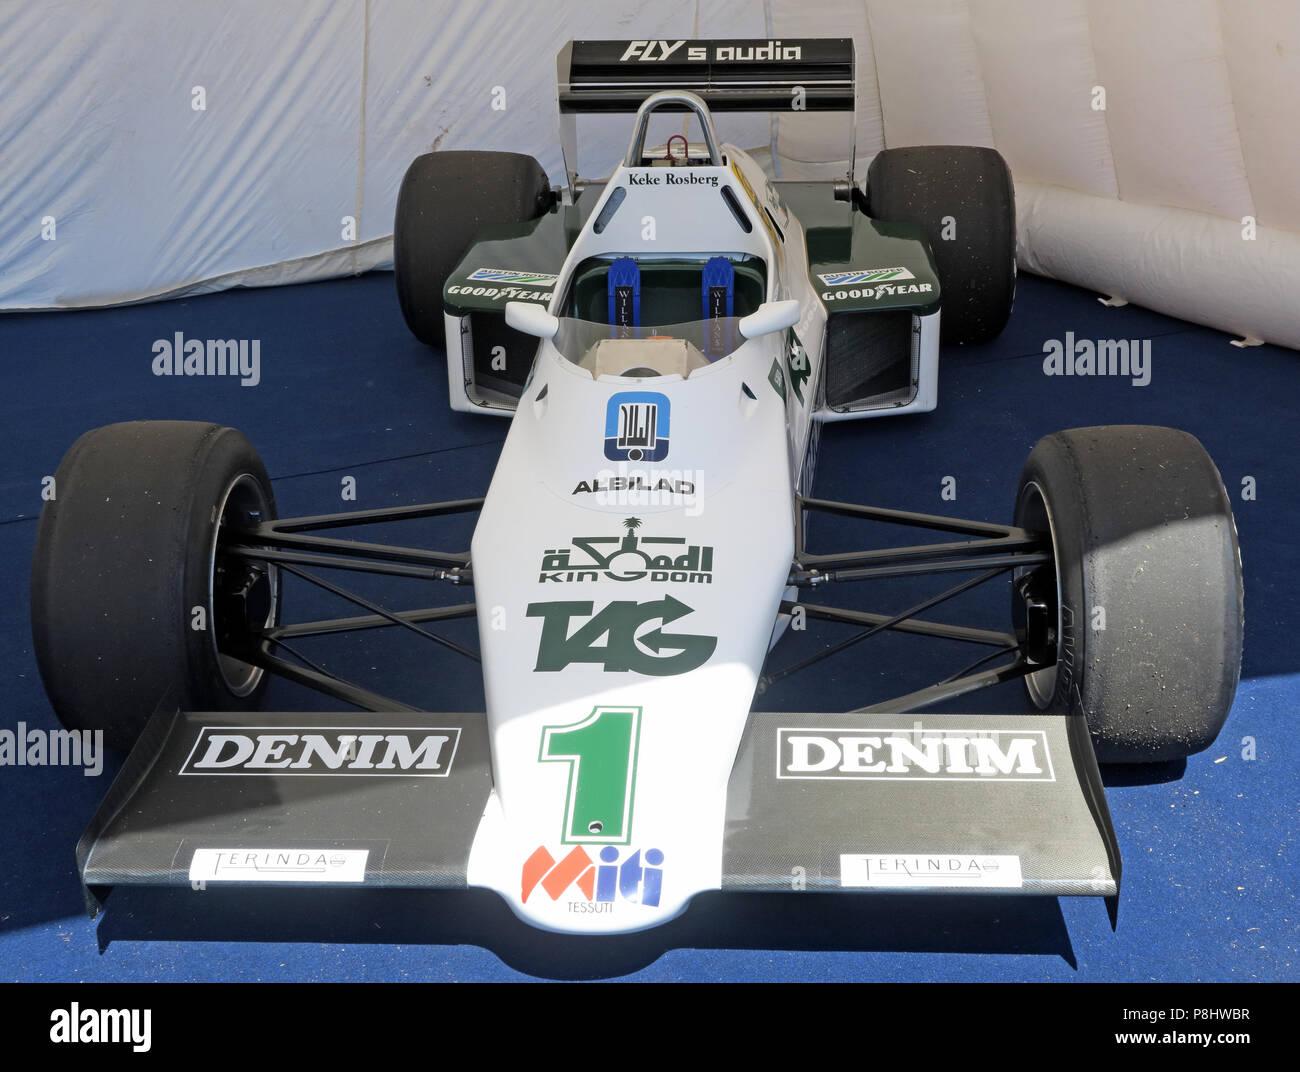 @HotpixUK,GoTonySmith,British GP 2018,car,Formula One,track,people,spectators,spectator,Denim,TAG,Fly Saudia,Miti,the circuit,circuit,F1,F1 Circuit,British,British Formula 1 Championship,white,Keke Rosberg / Formula One F1 racing car,sponsored by Denim - Williams Cosworth FW08C driven by,racing,vehicle,sponsored,Williams Cosworth